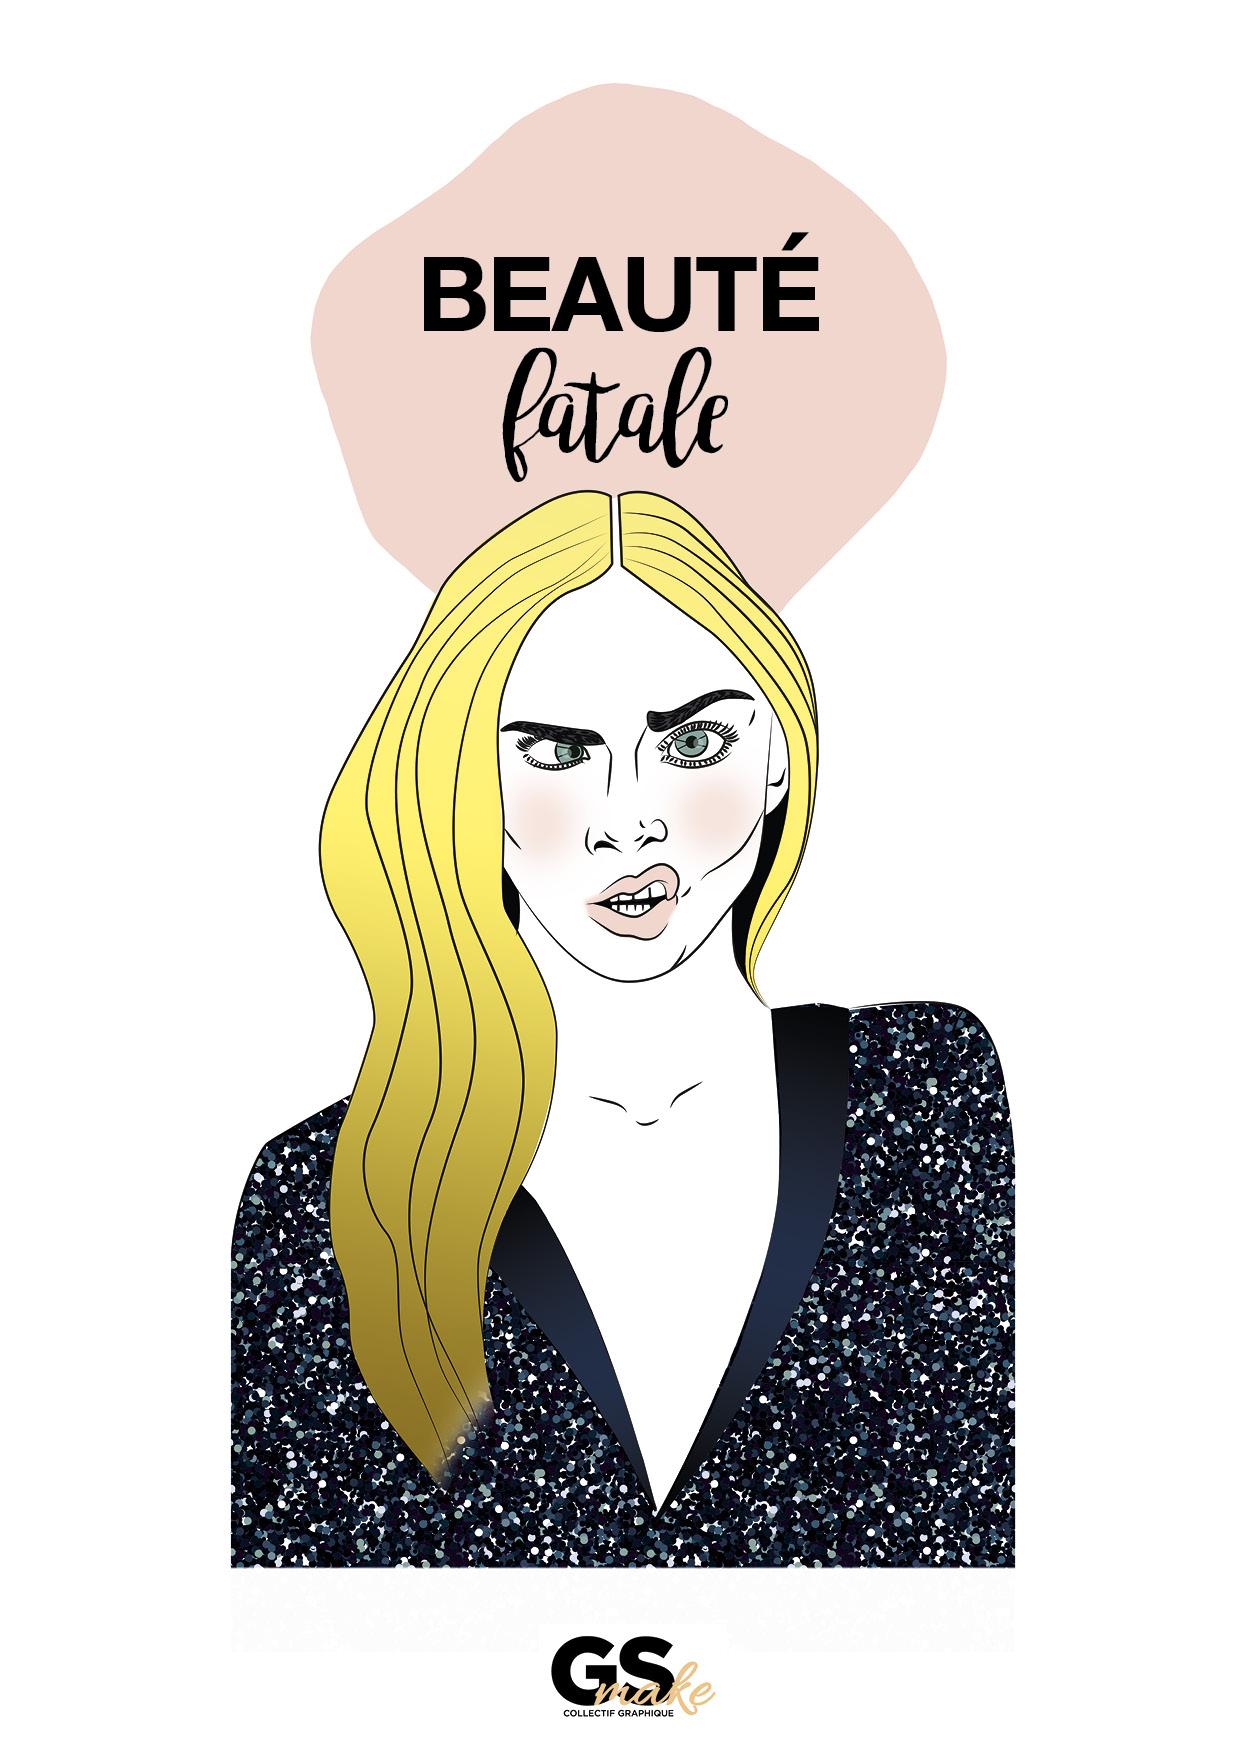 beaute_fatale_illustration